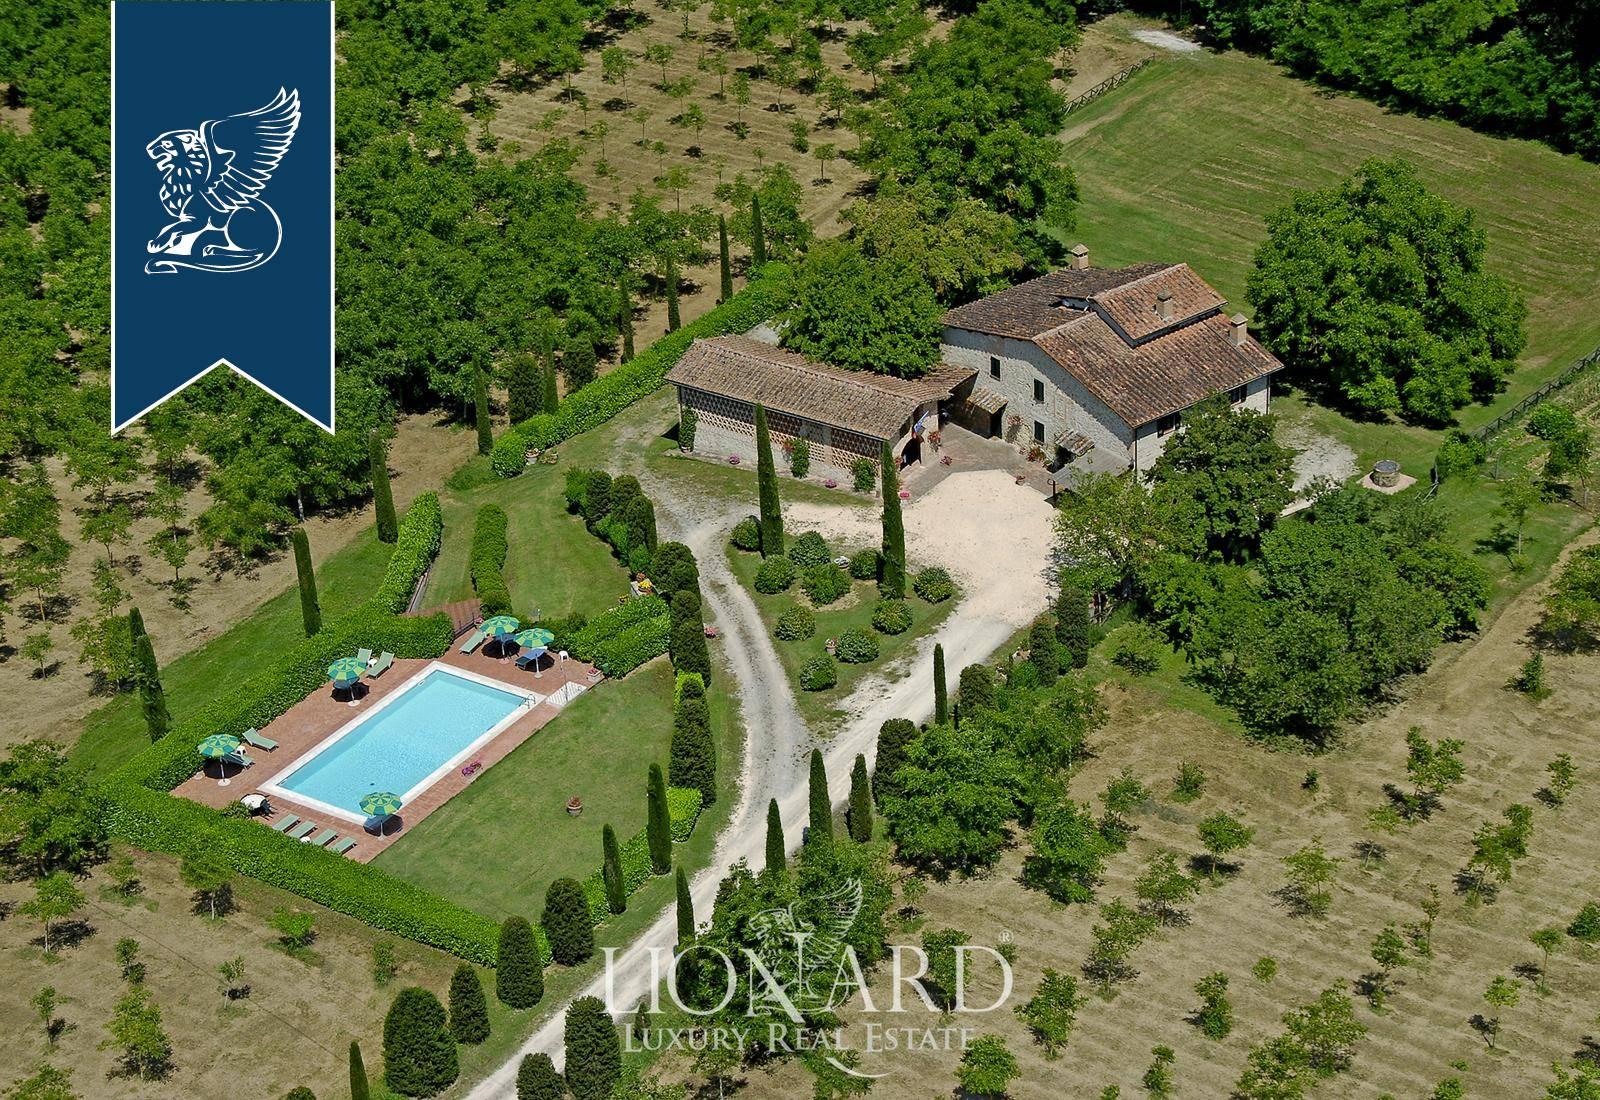 Agriturismo in Vendita a San Gimignano: 0 locali, 420 mq - Foto 2